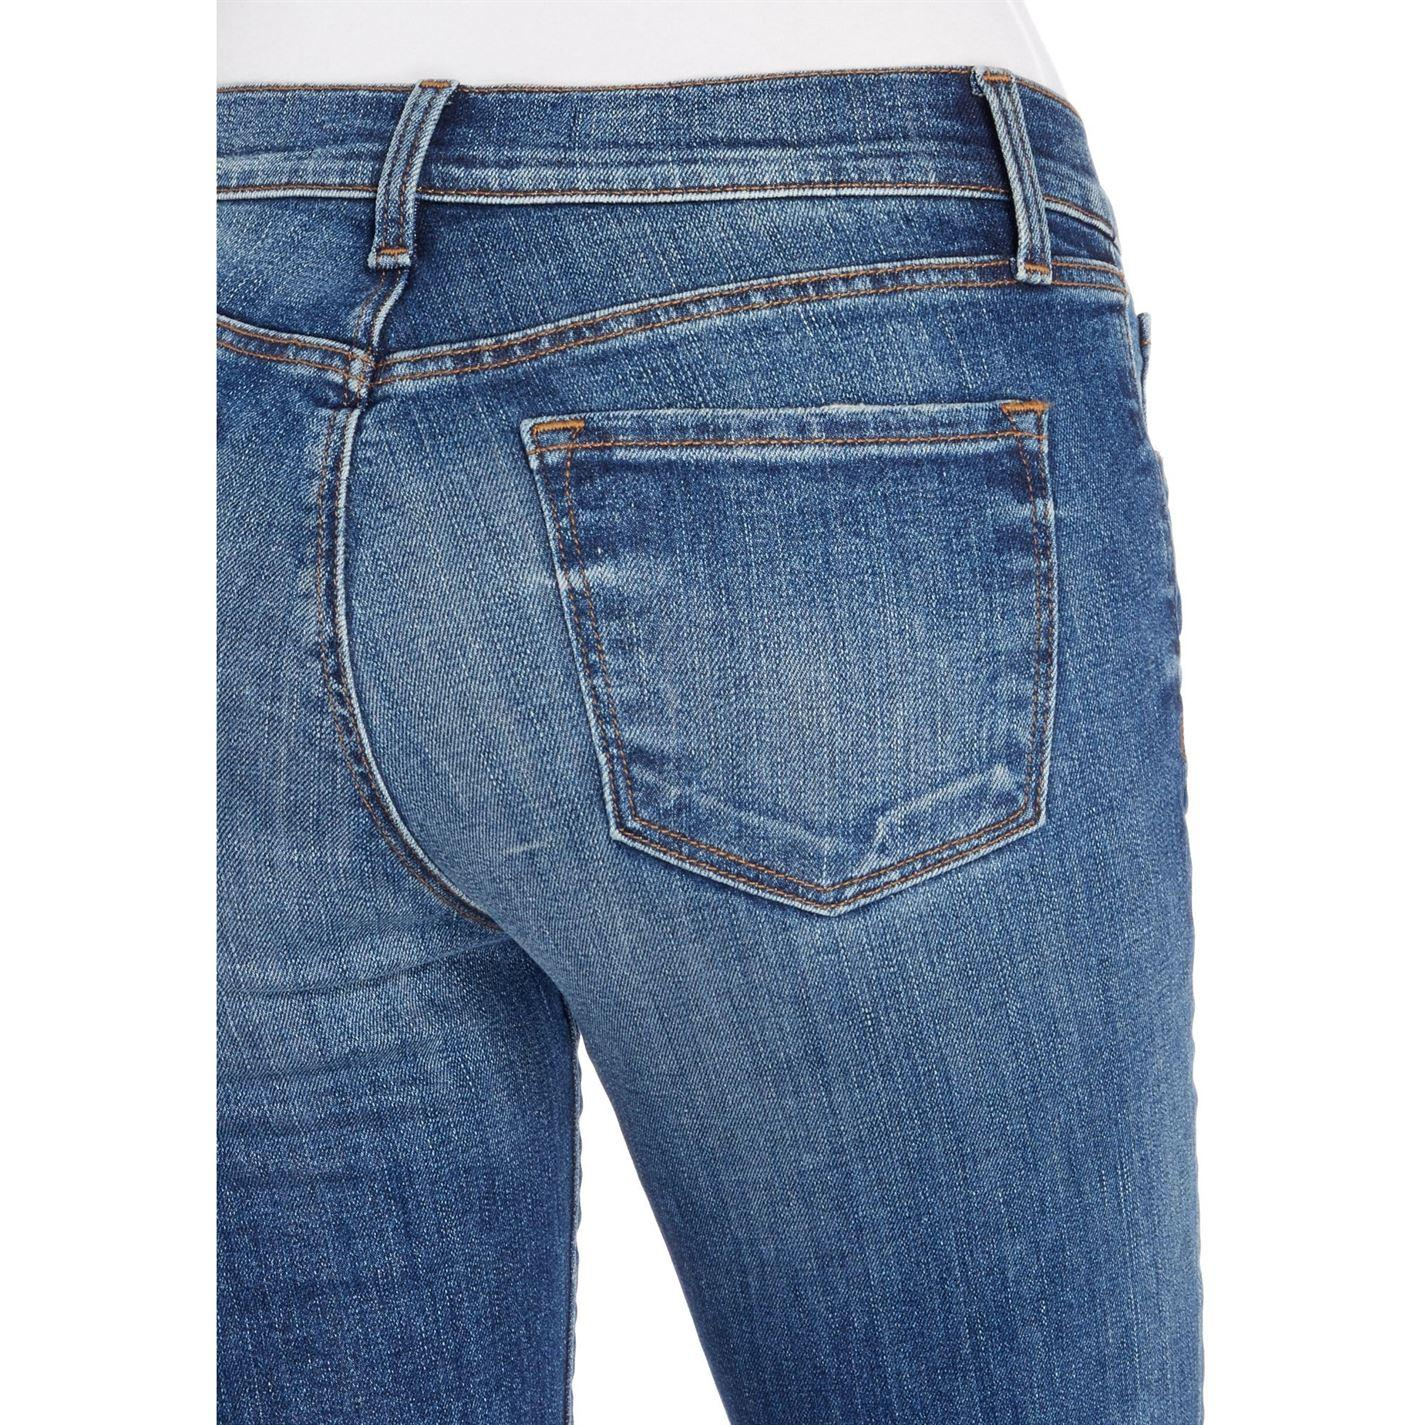 J Brand Denim Selena Crop Boot Raw Hem Jeans In Revoke Destruct in Denim Mid Wash (Blue)